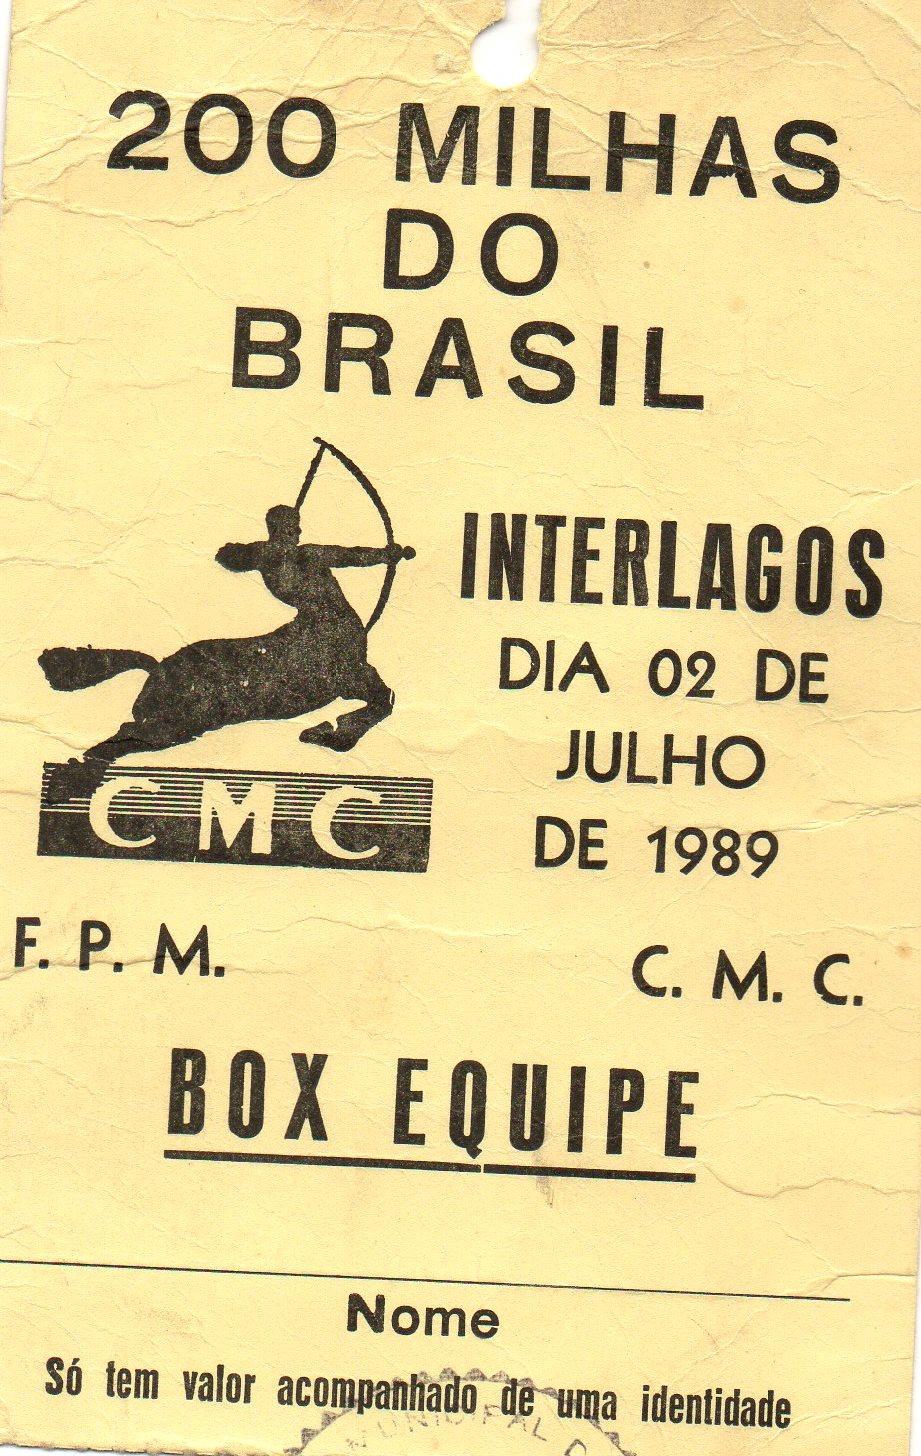 Credencial de 1989 de José Luiz Gonsalves Foto: acervo José Luiz / Motostory